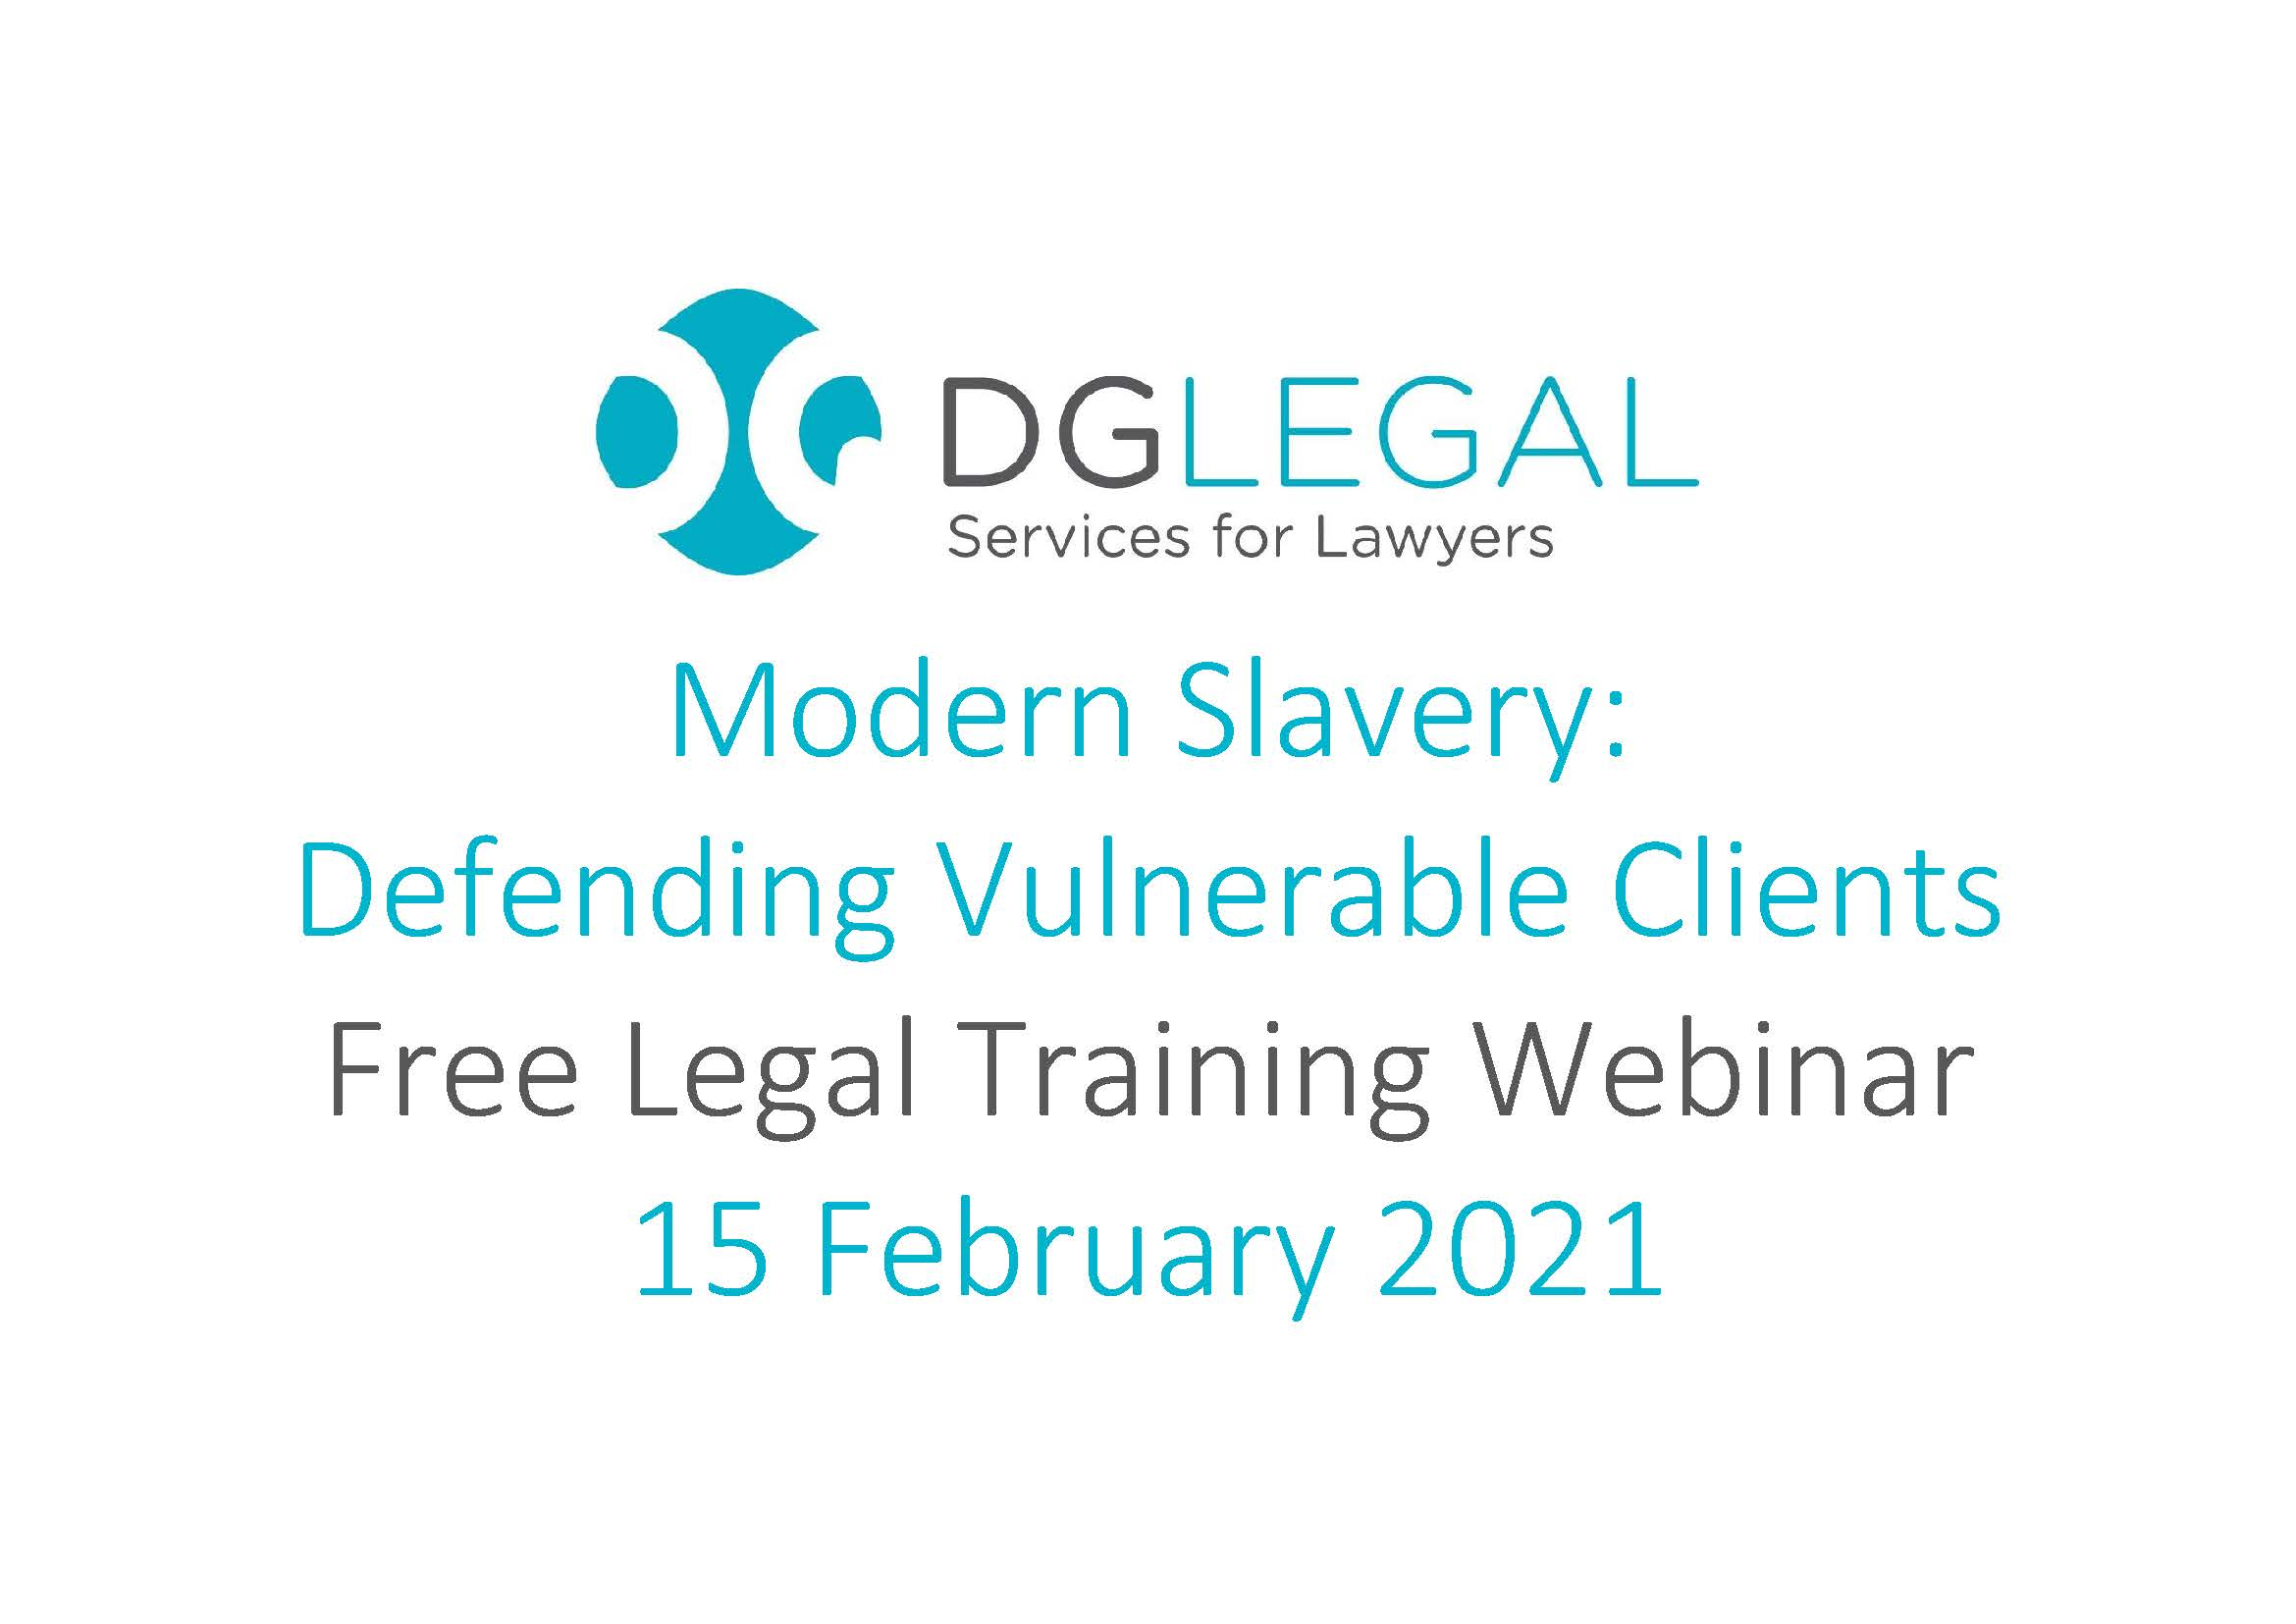 Modern Slavery Defending Vulnerable Clients